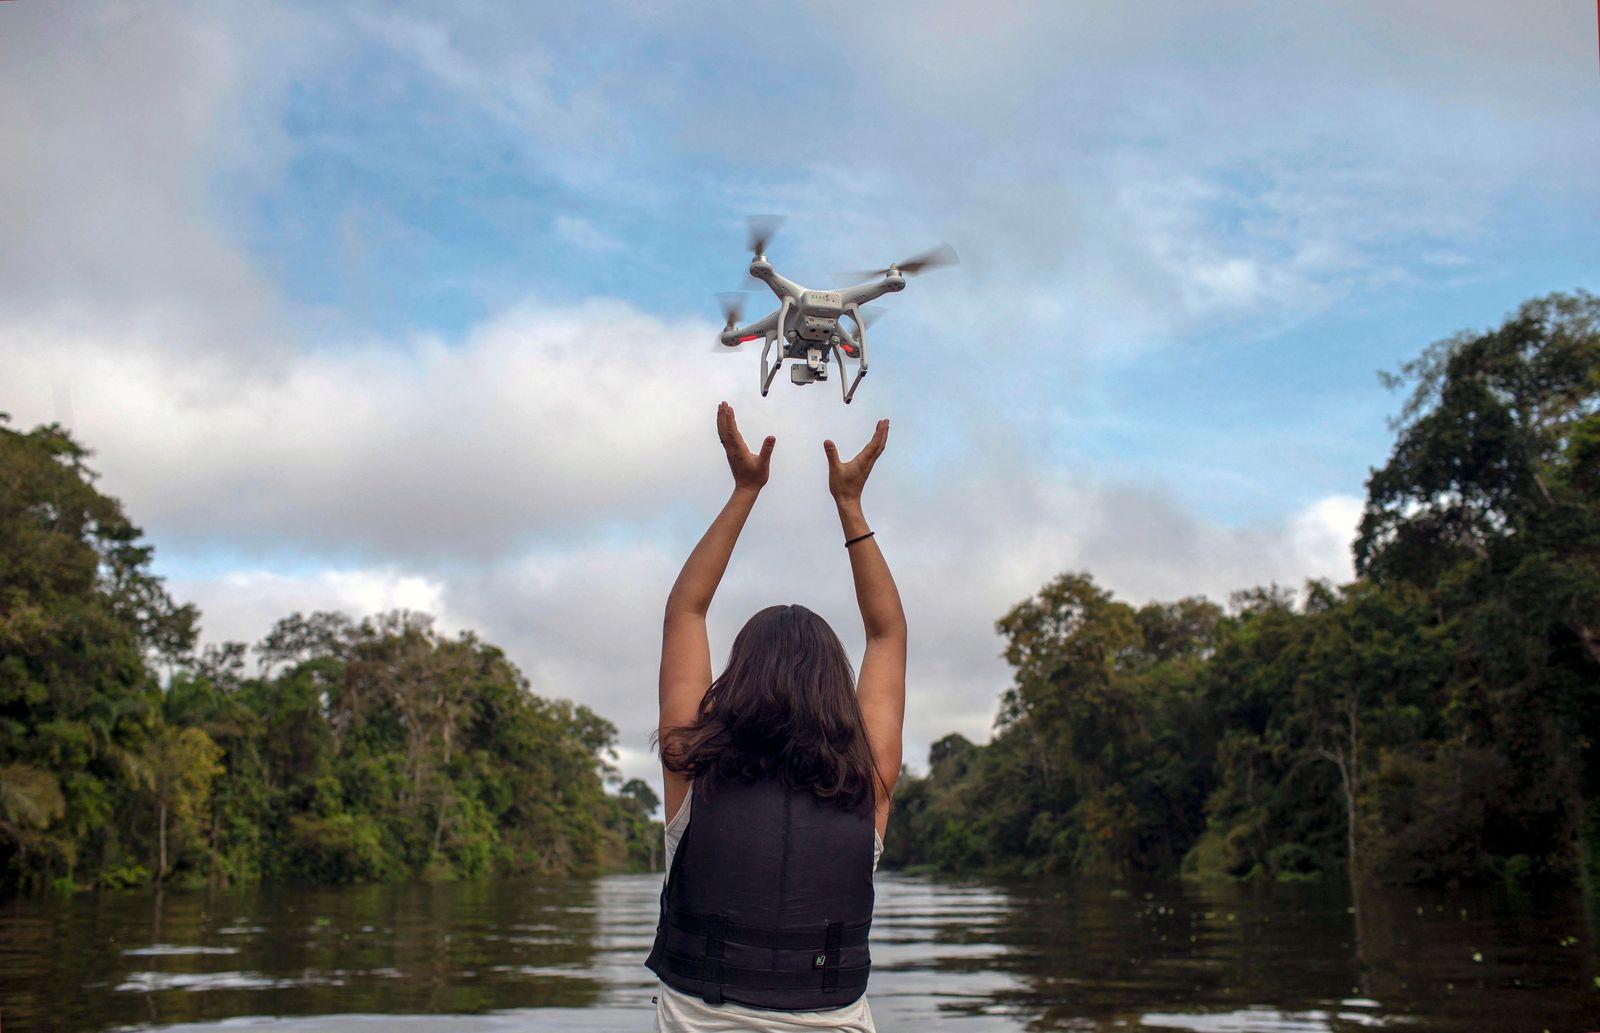 BRAZIL-AMAZON-RIVER-DOLPHINS-DRONES